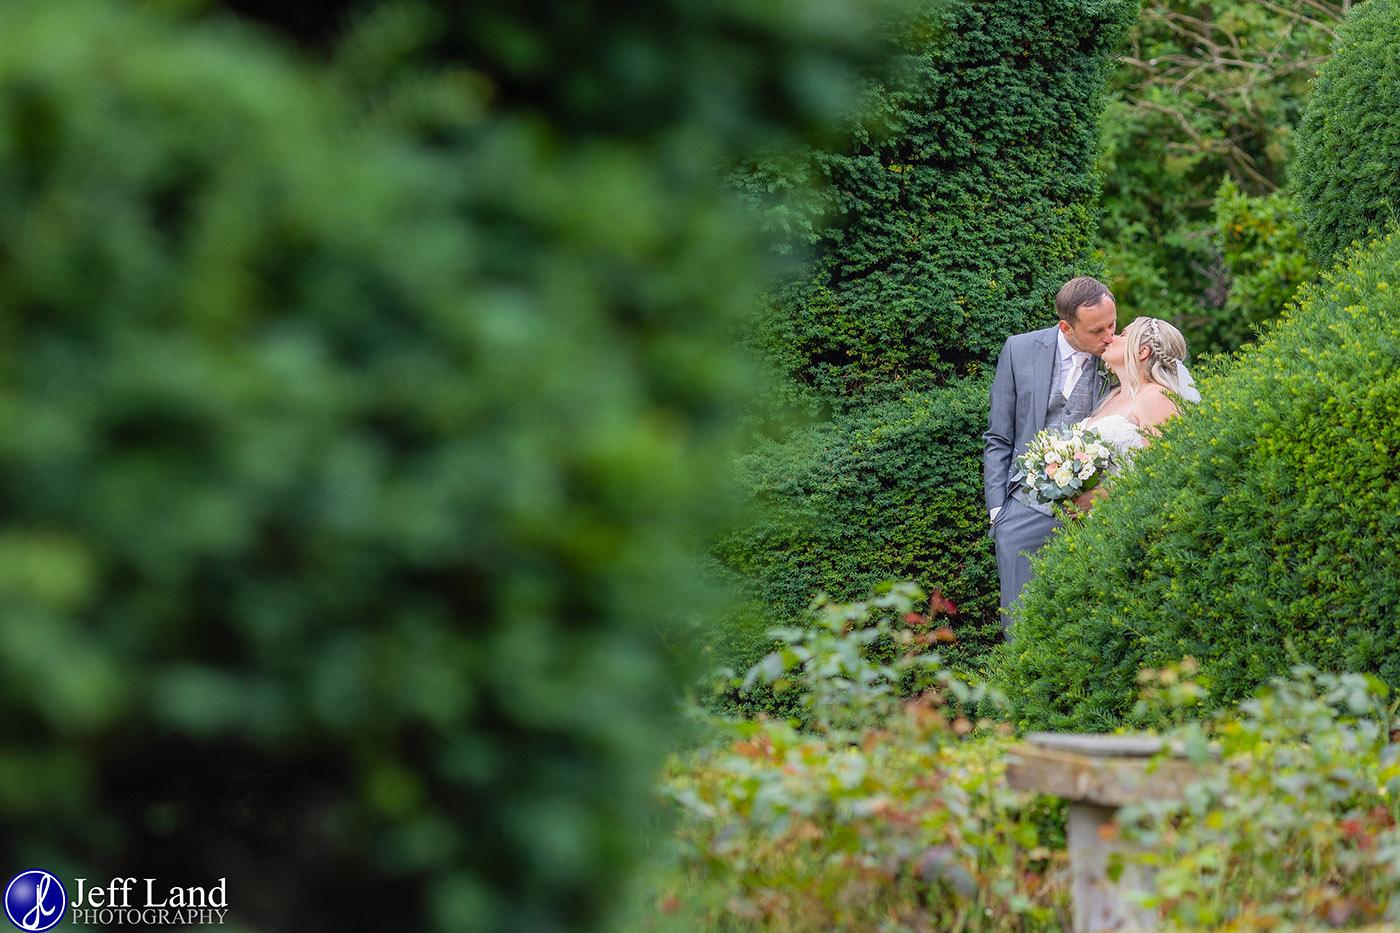 Billesley Manor Bridal Portrait in Topary Garden